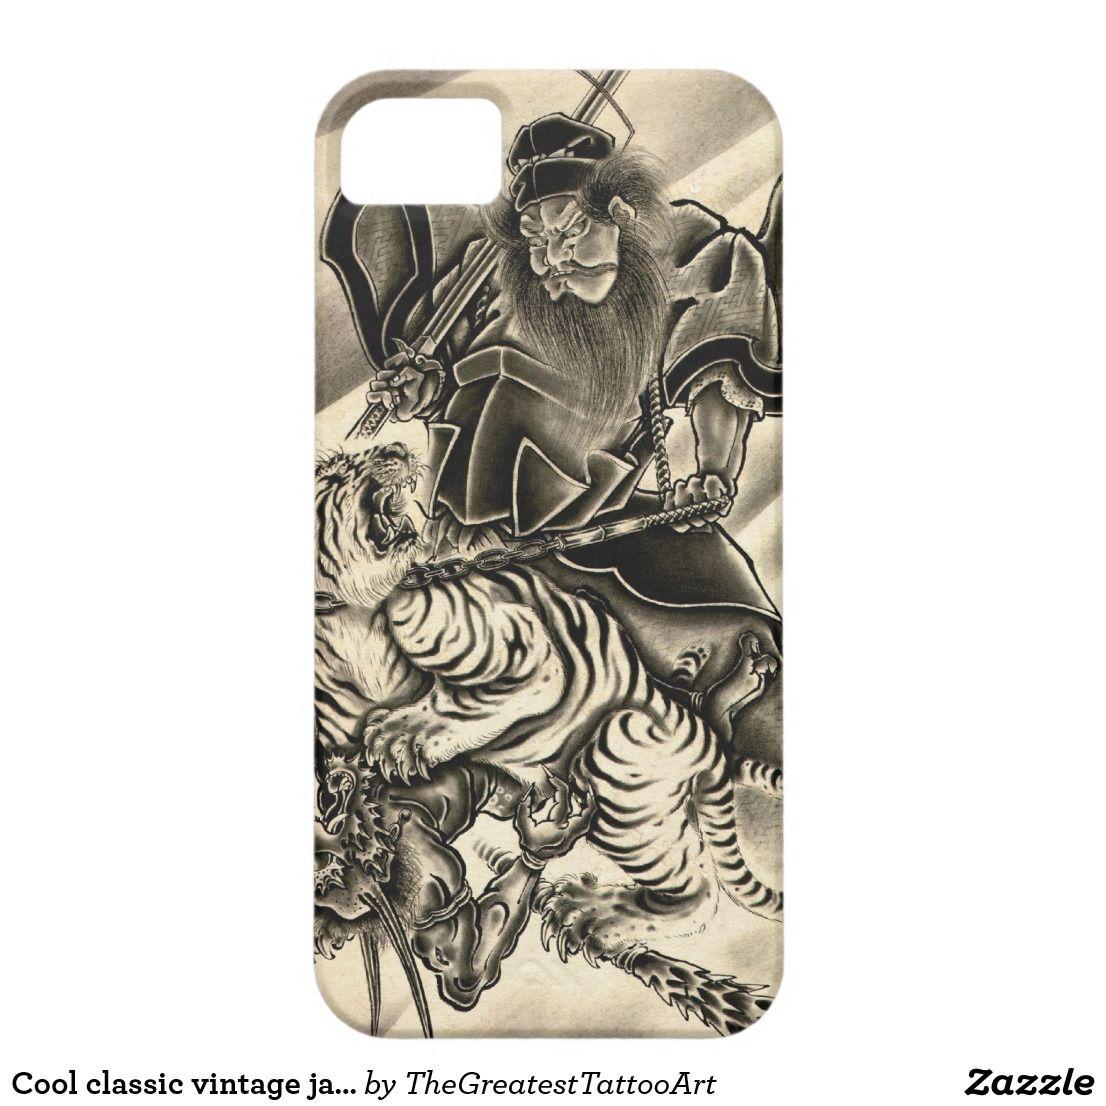 samurai tiger tattoo demon samurai tiger iphone tiger. Black Bedroom Furniture Sets. Home Design Ideas